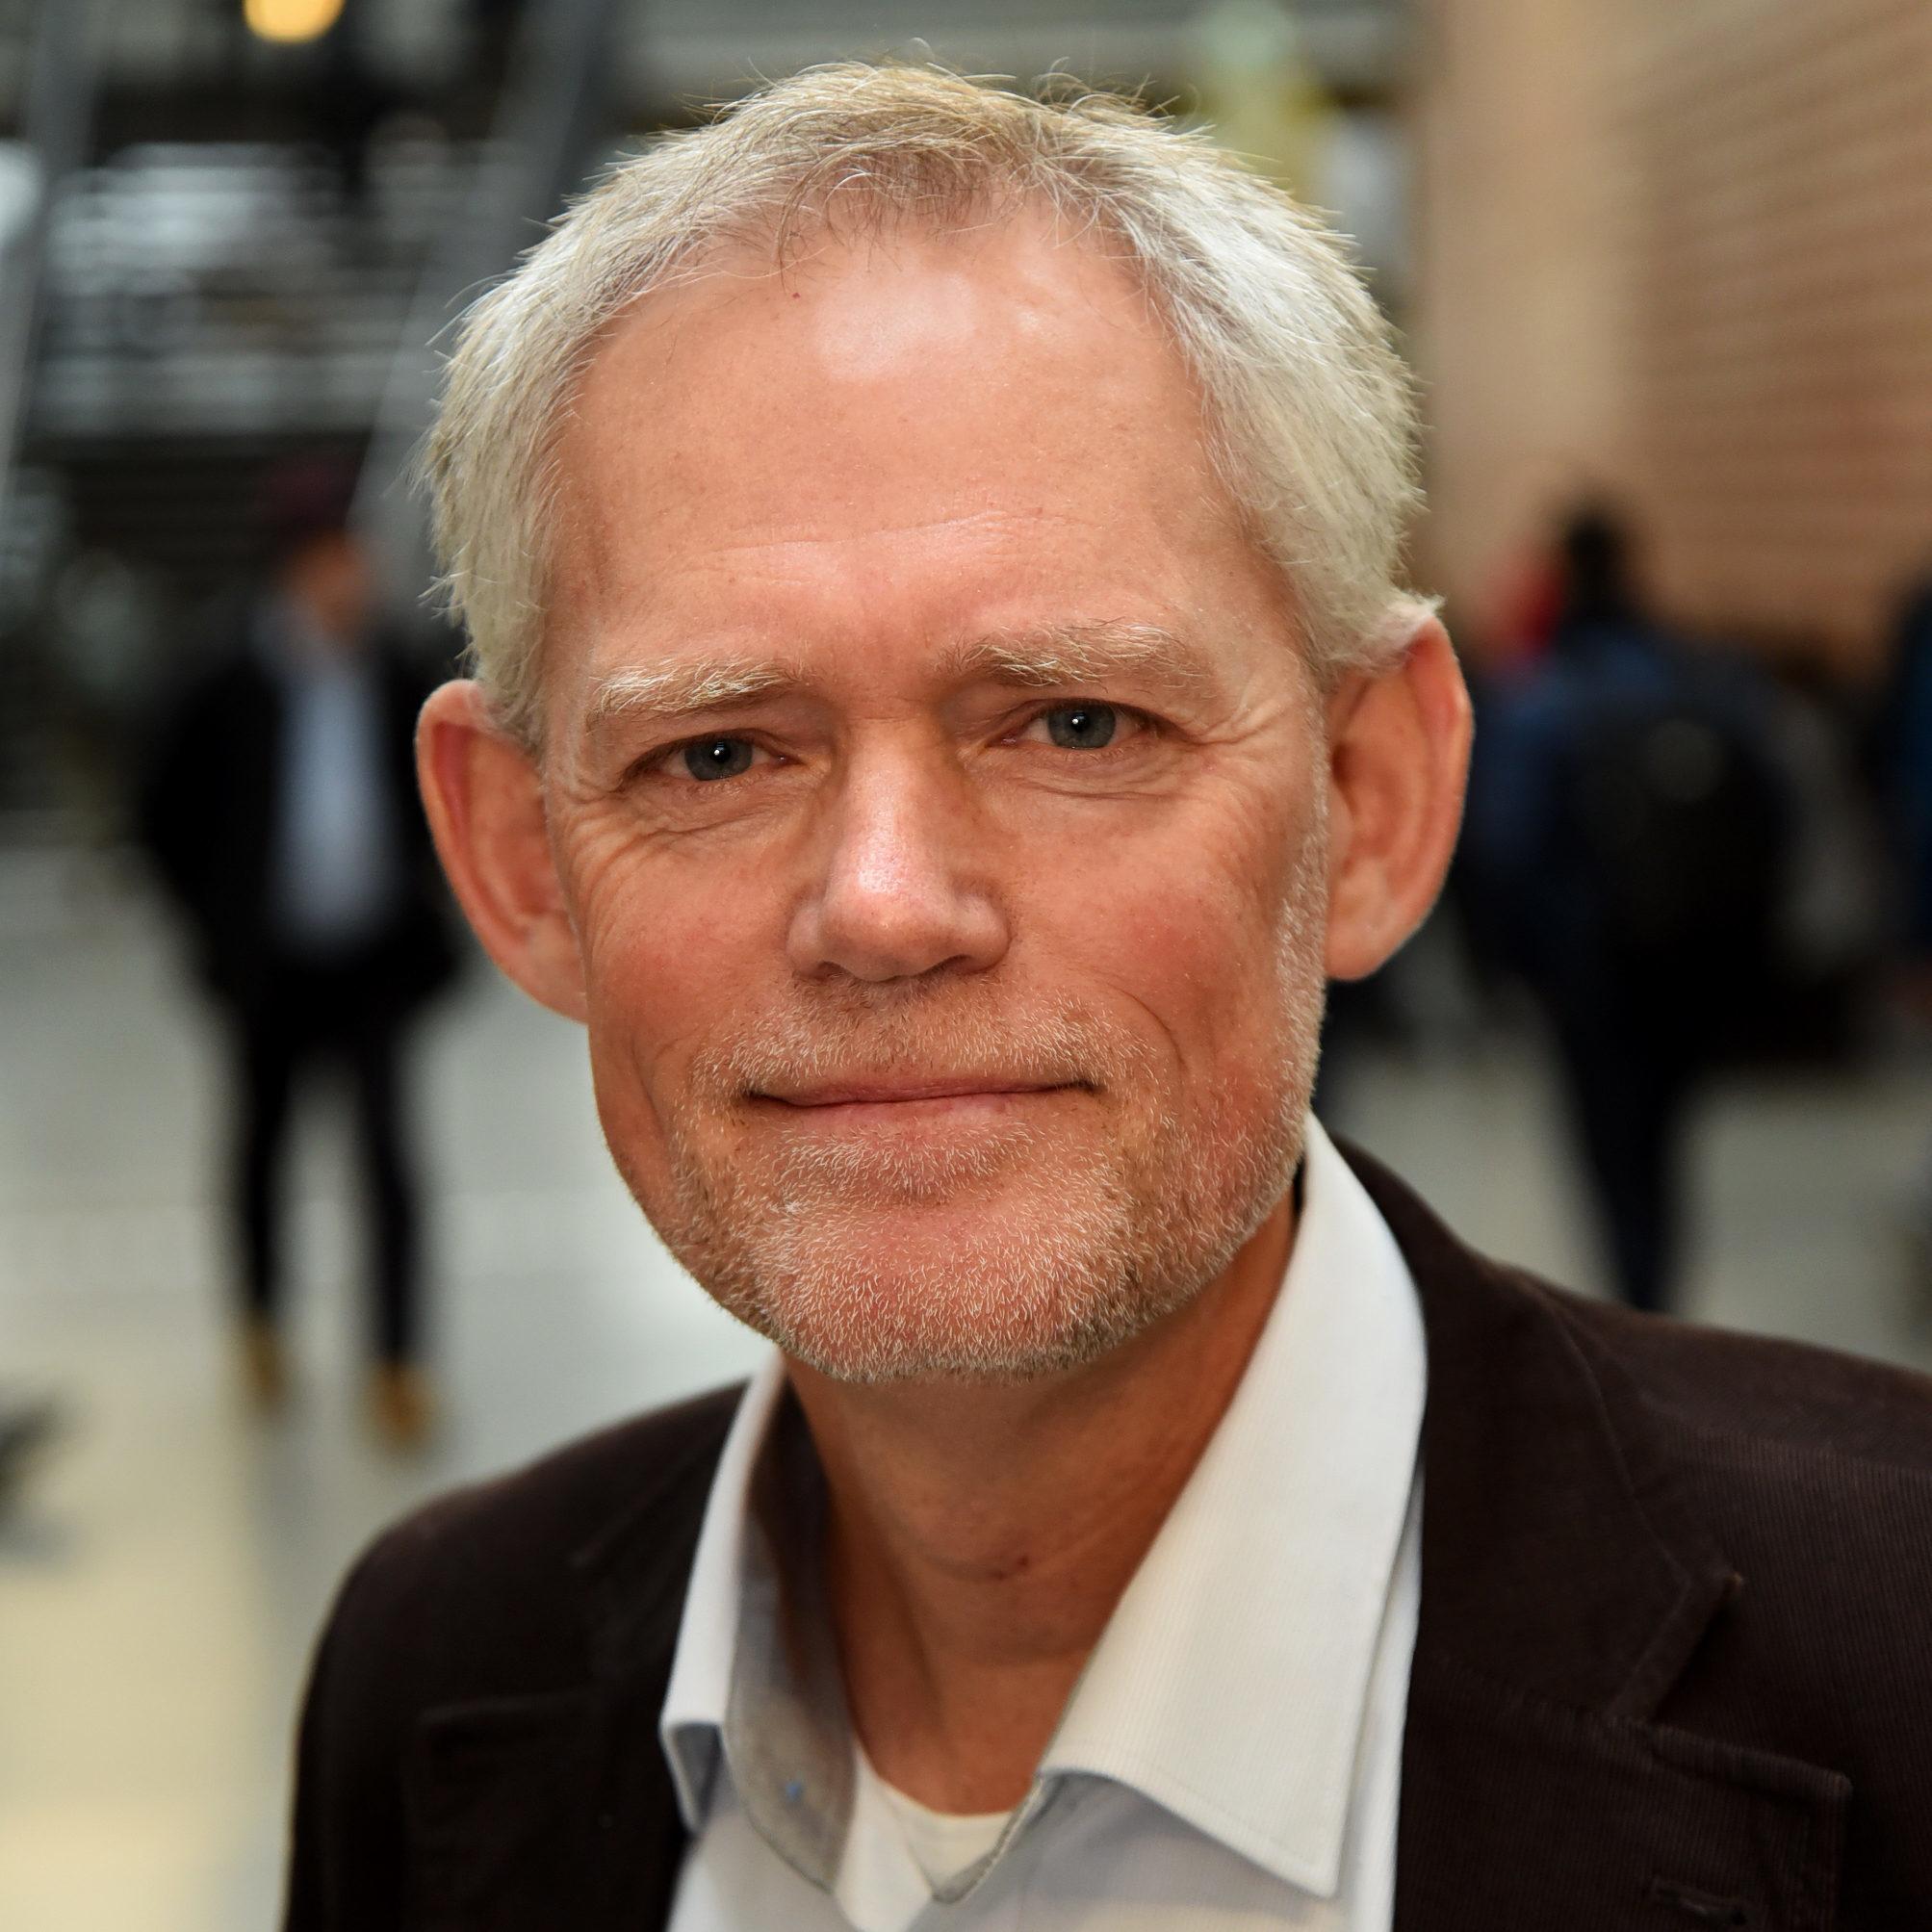 profile image Martin Engebretsen